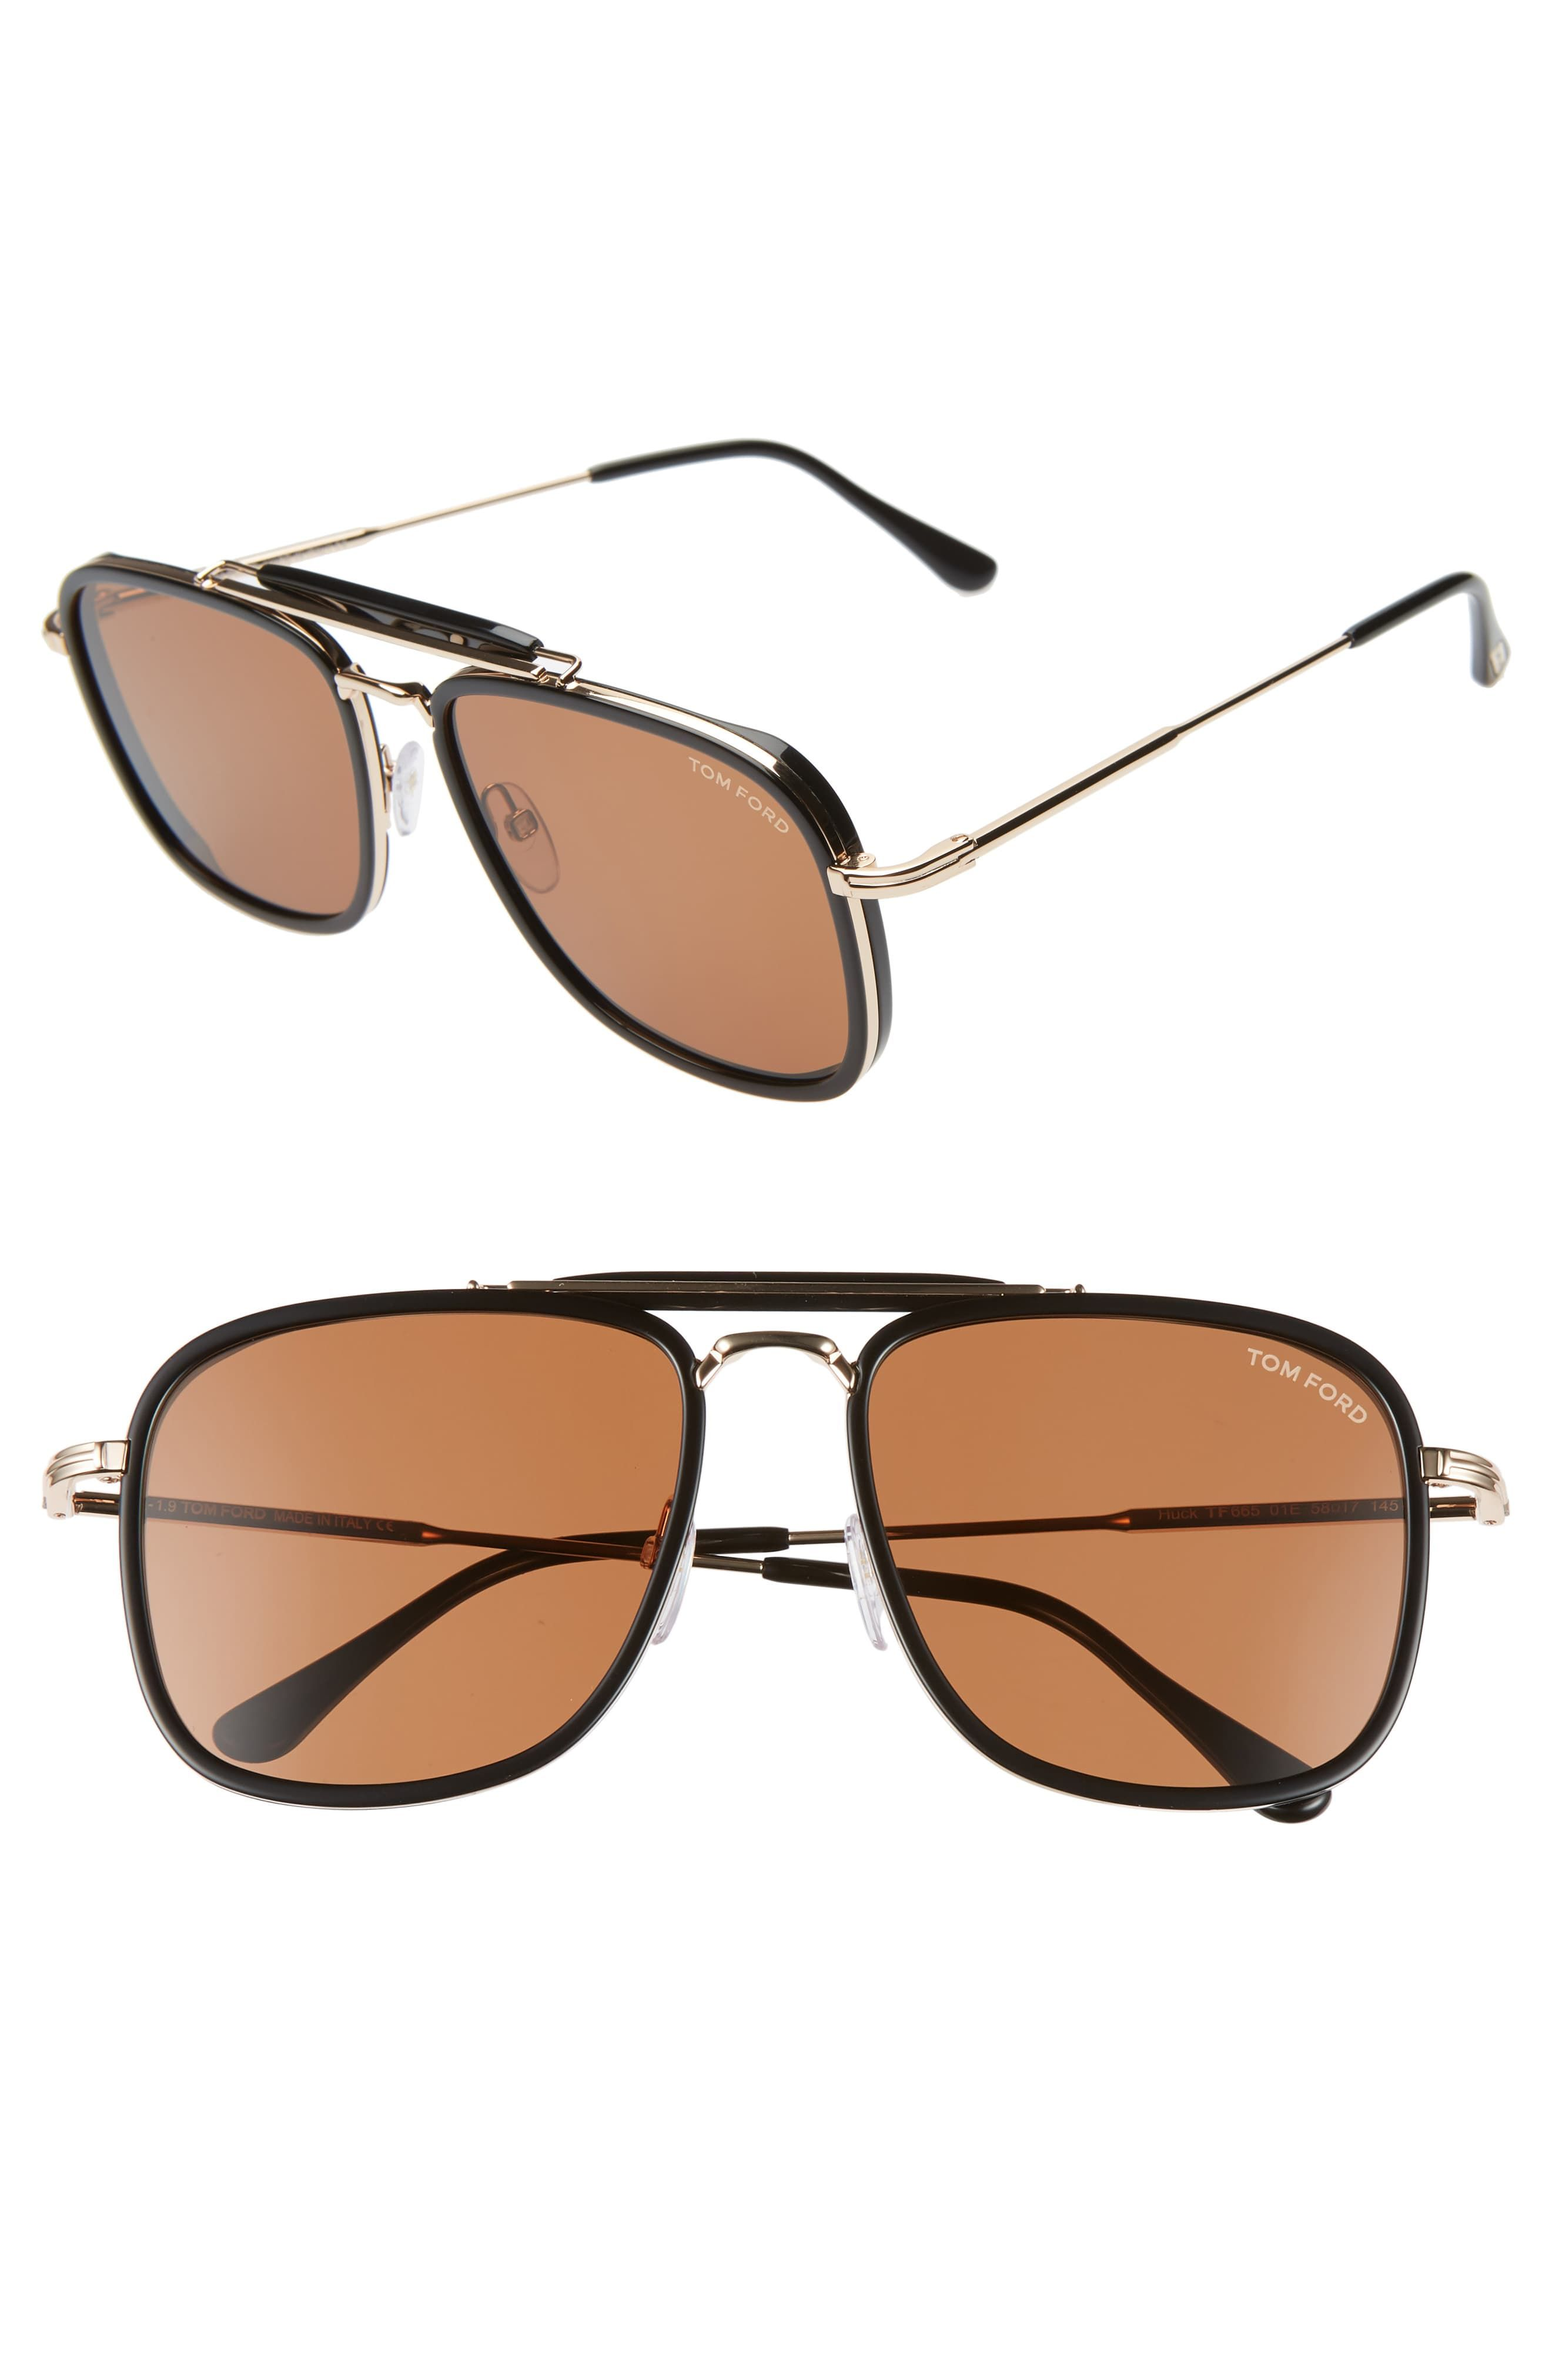 af1922596 Tom Ford 58mm Navigator Sunglasses in 2019 | Products | Tom ford ...